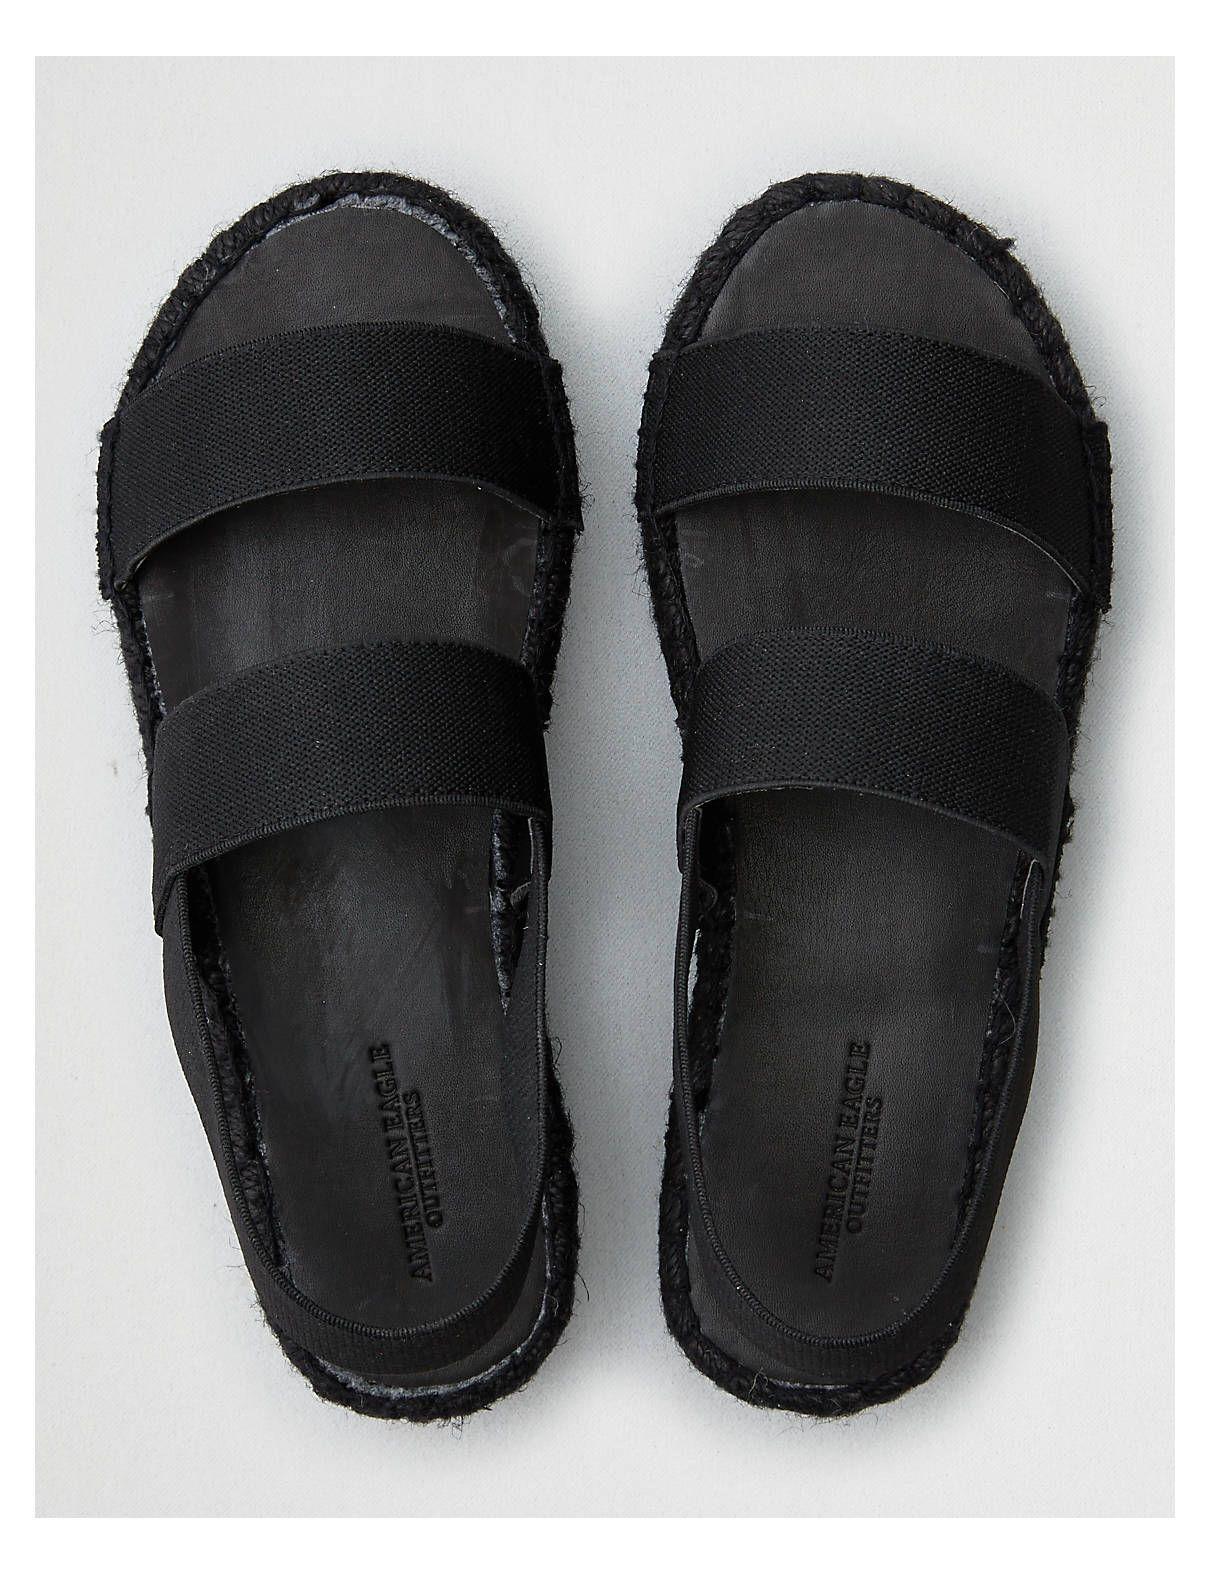 880f6cc6d02 AE X-Band Flatform Wedge Sandal | Shoes! | Shoes, Espadrille sandals ...